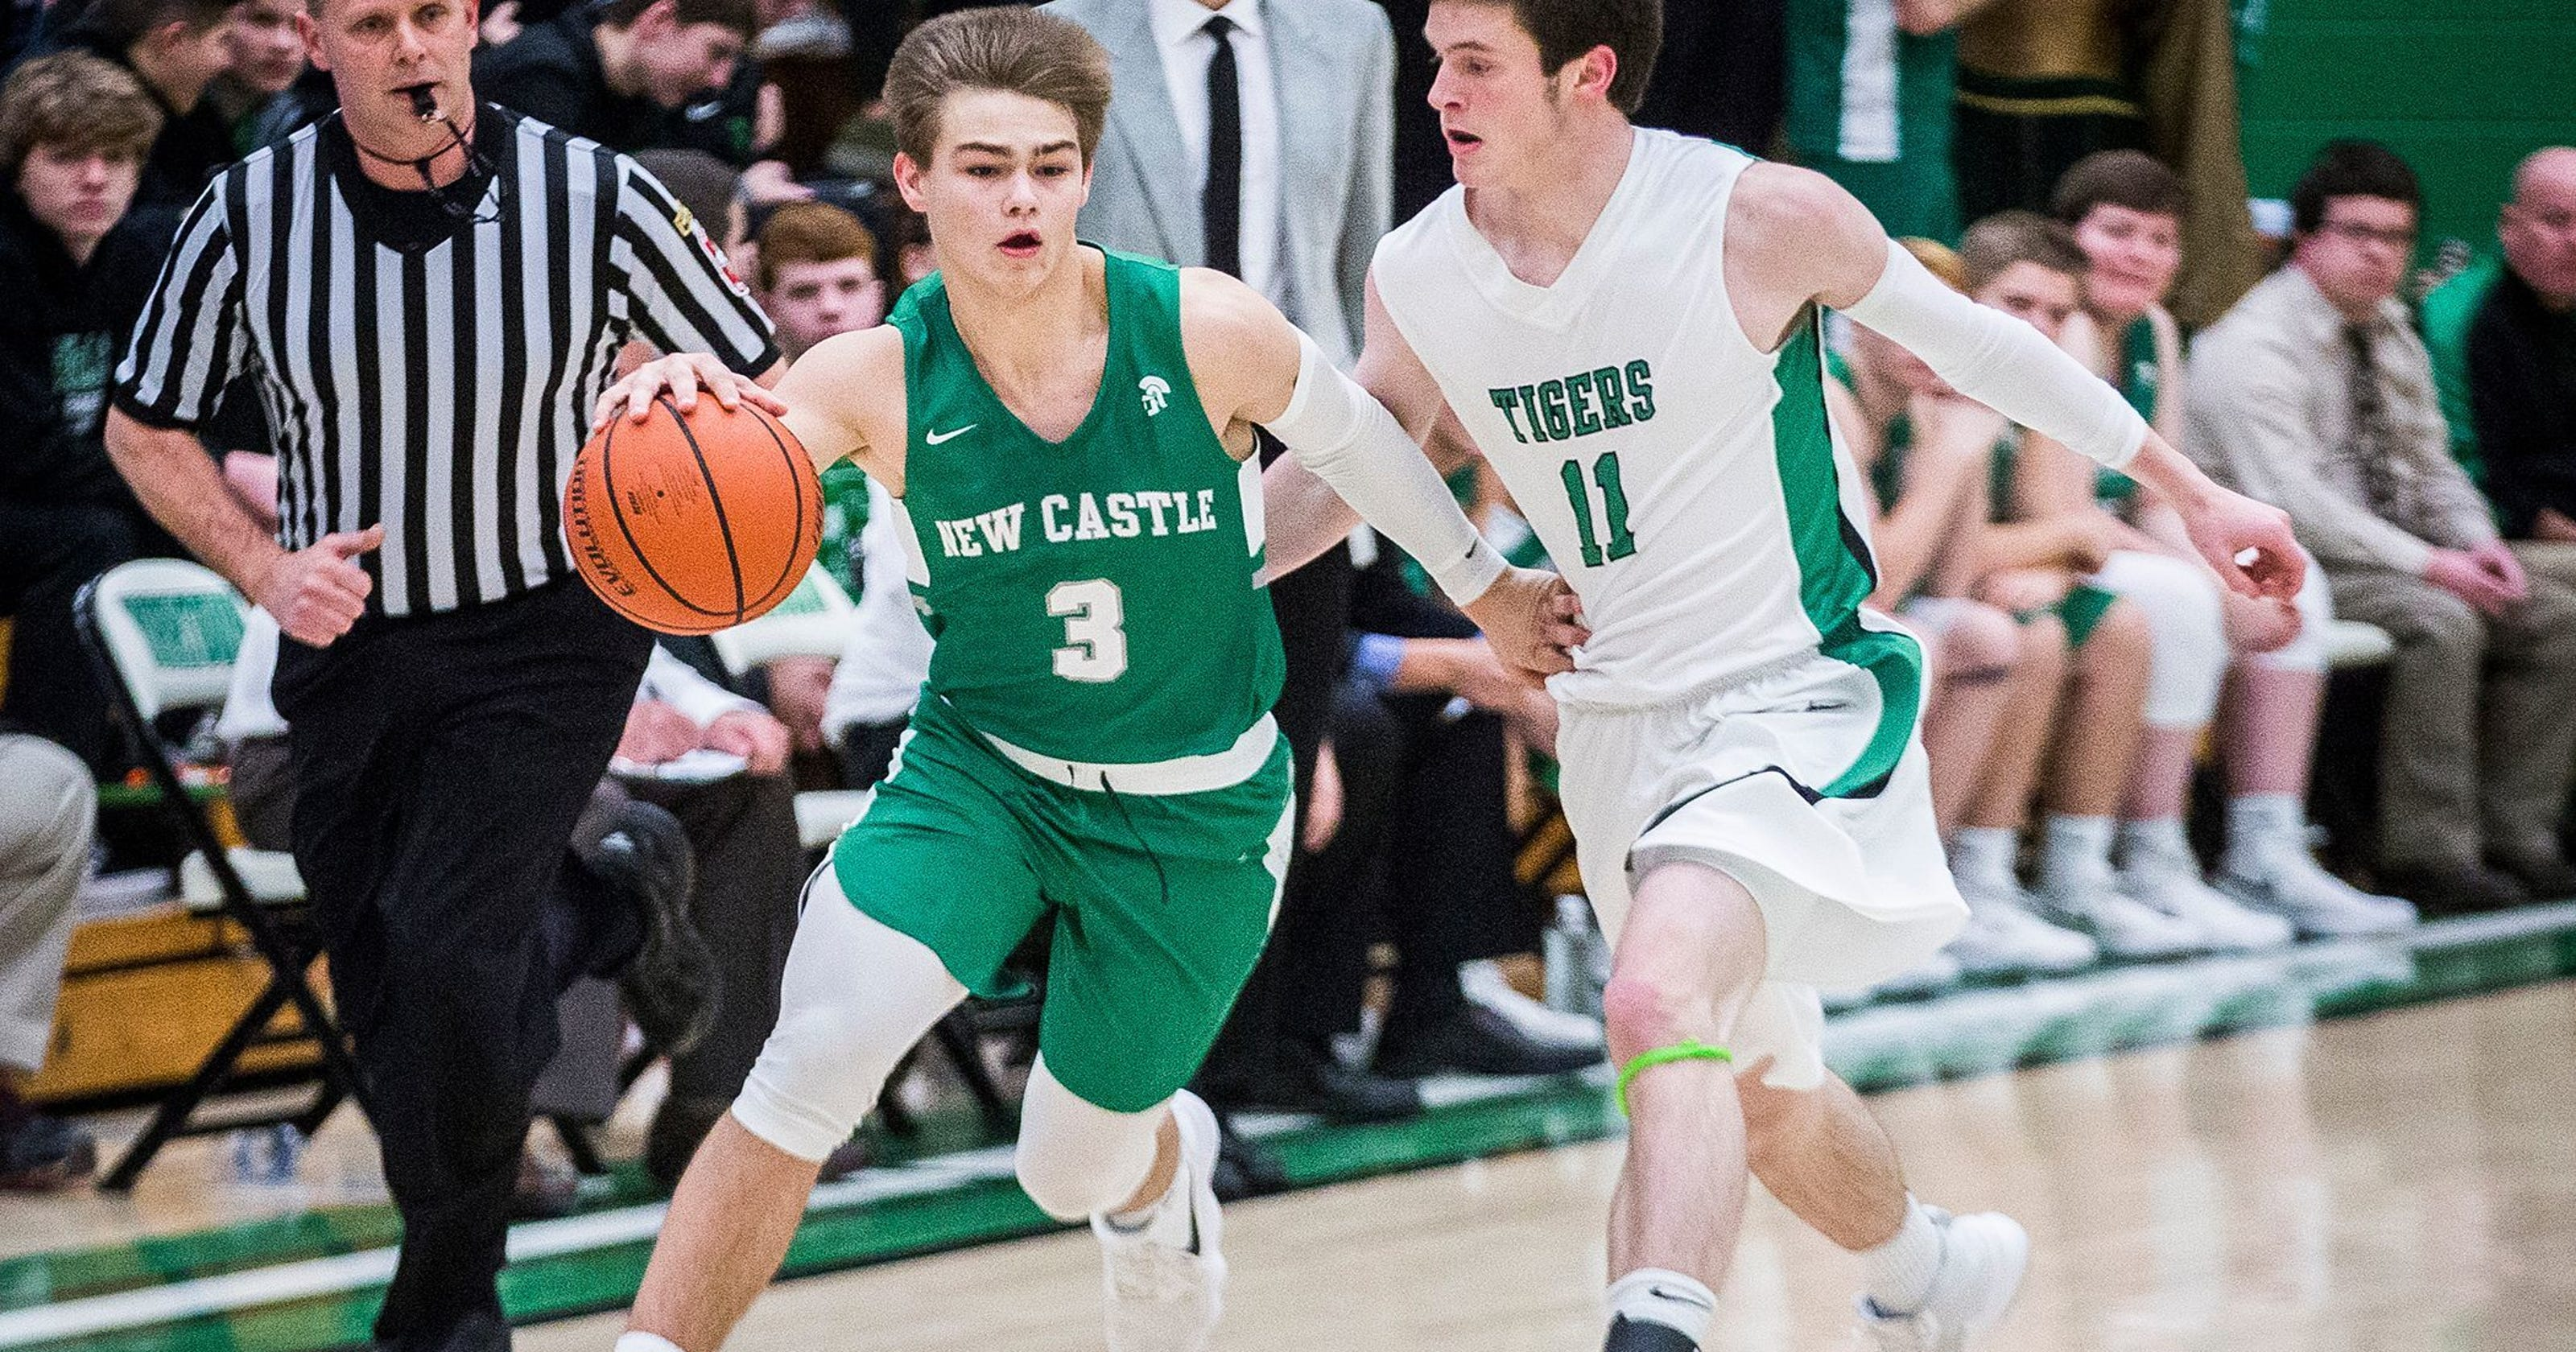 HS Basketball – Excel High School Sports